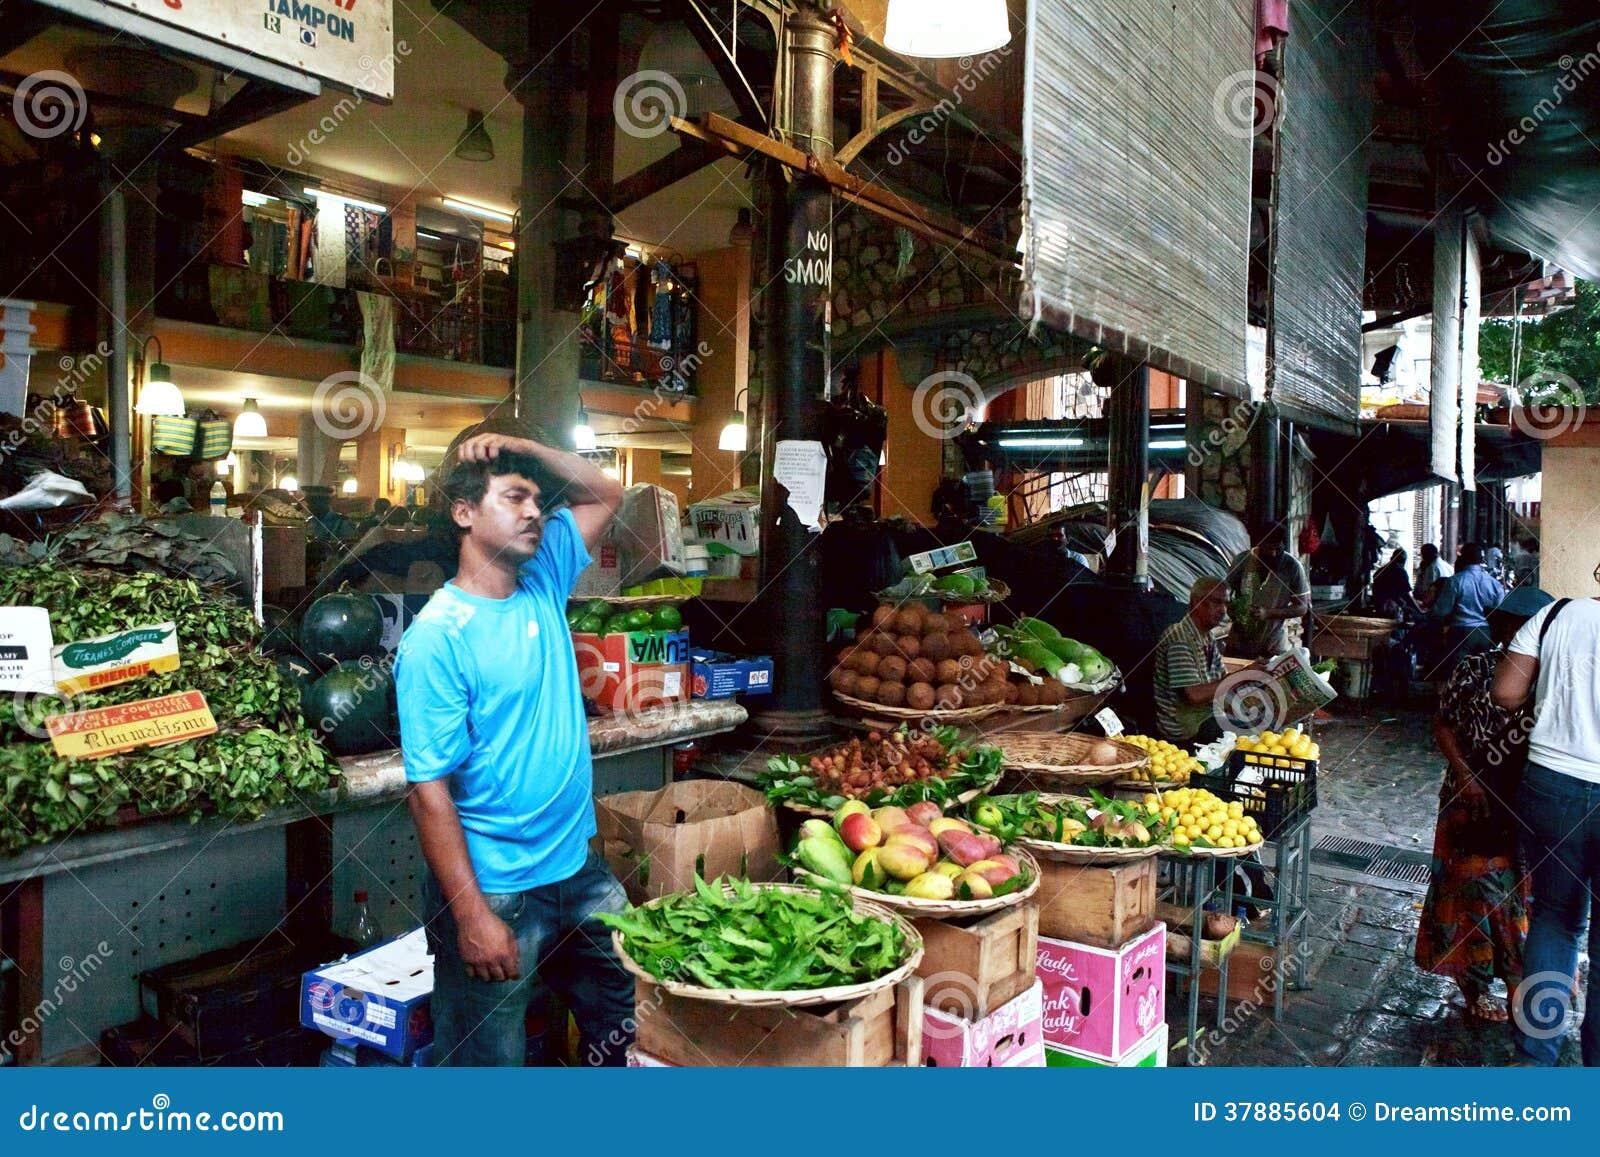 Central market of port louis mauritius editorial stock image image 37885604 - Mauritius market port louis ...